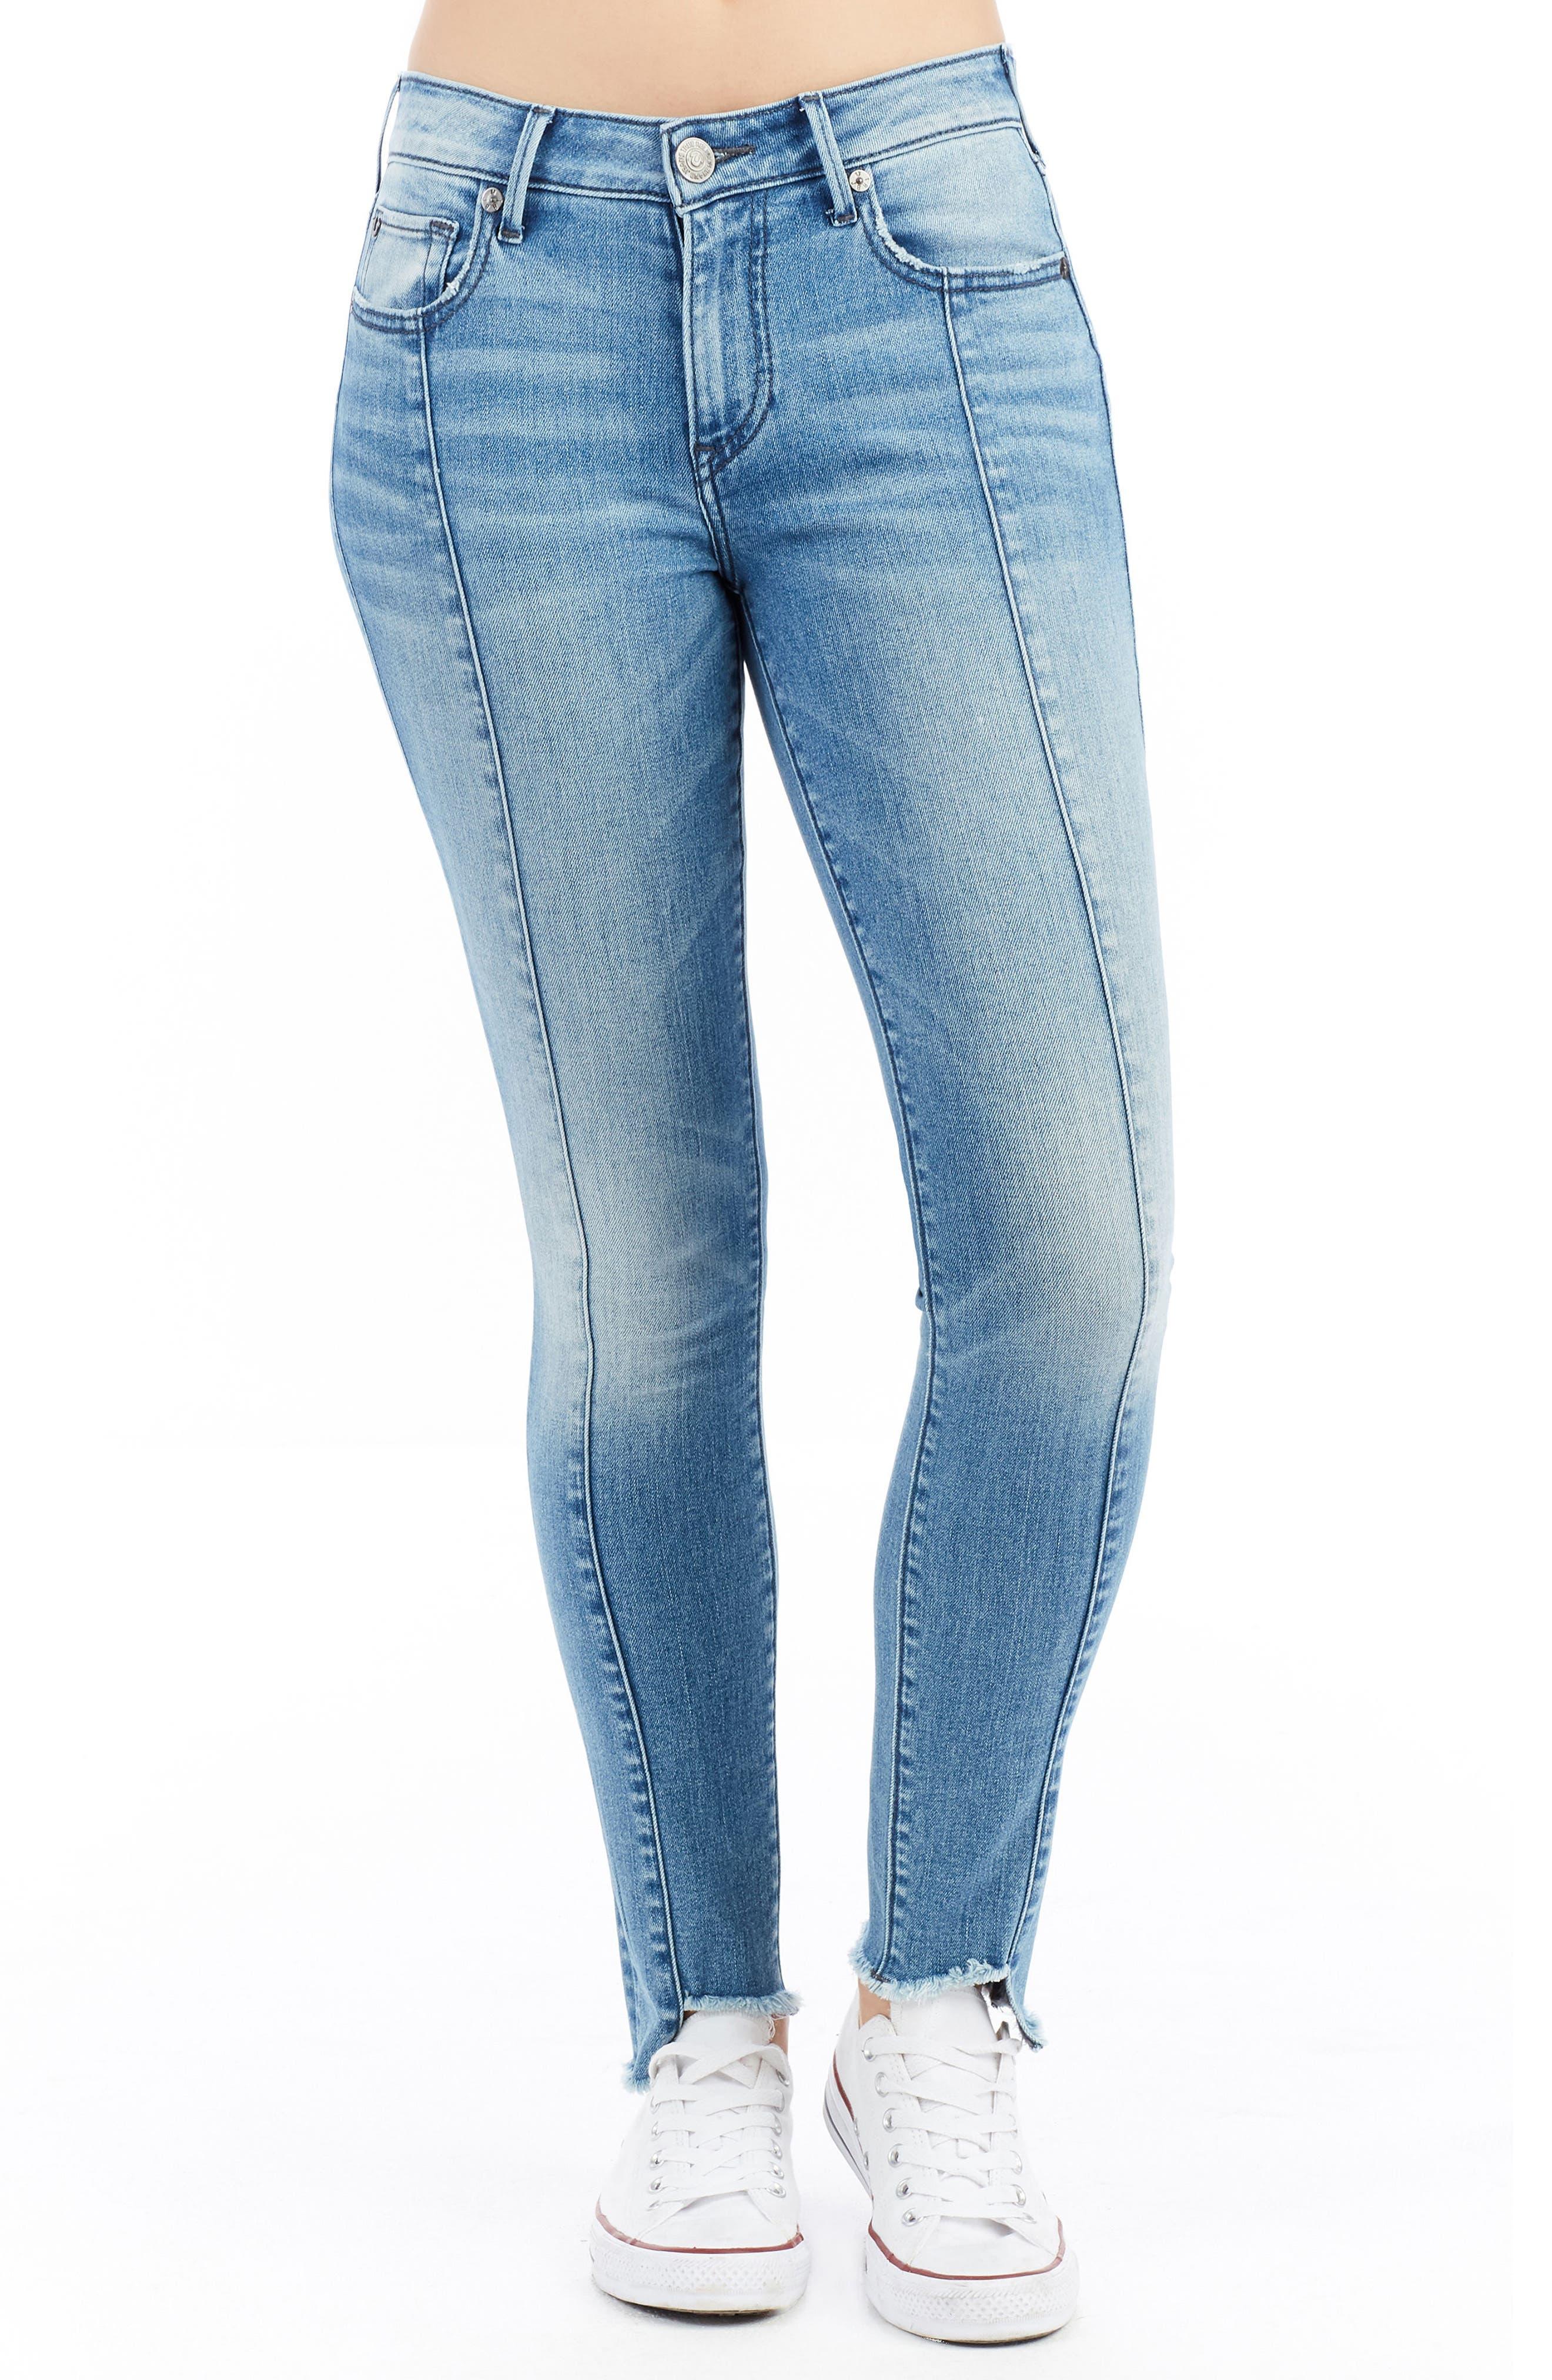 Main Image - True Religion Brand Jeans Jennie Curvy Ankle Skinny Jeans (Island Fever)